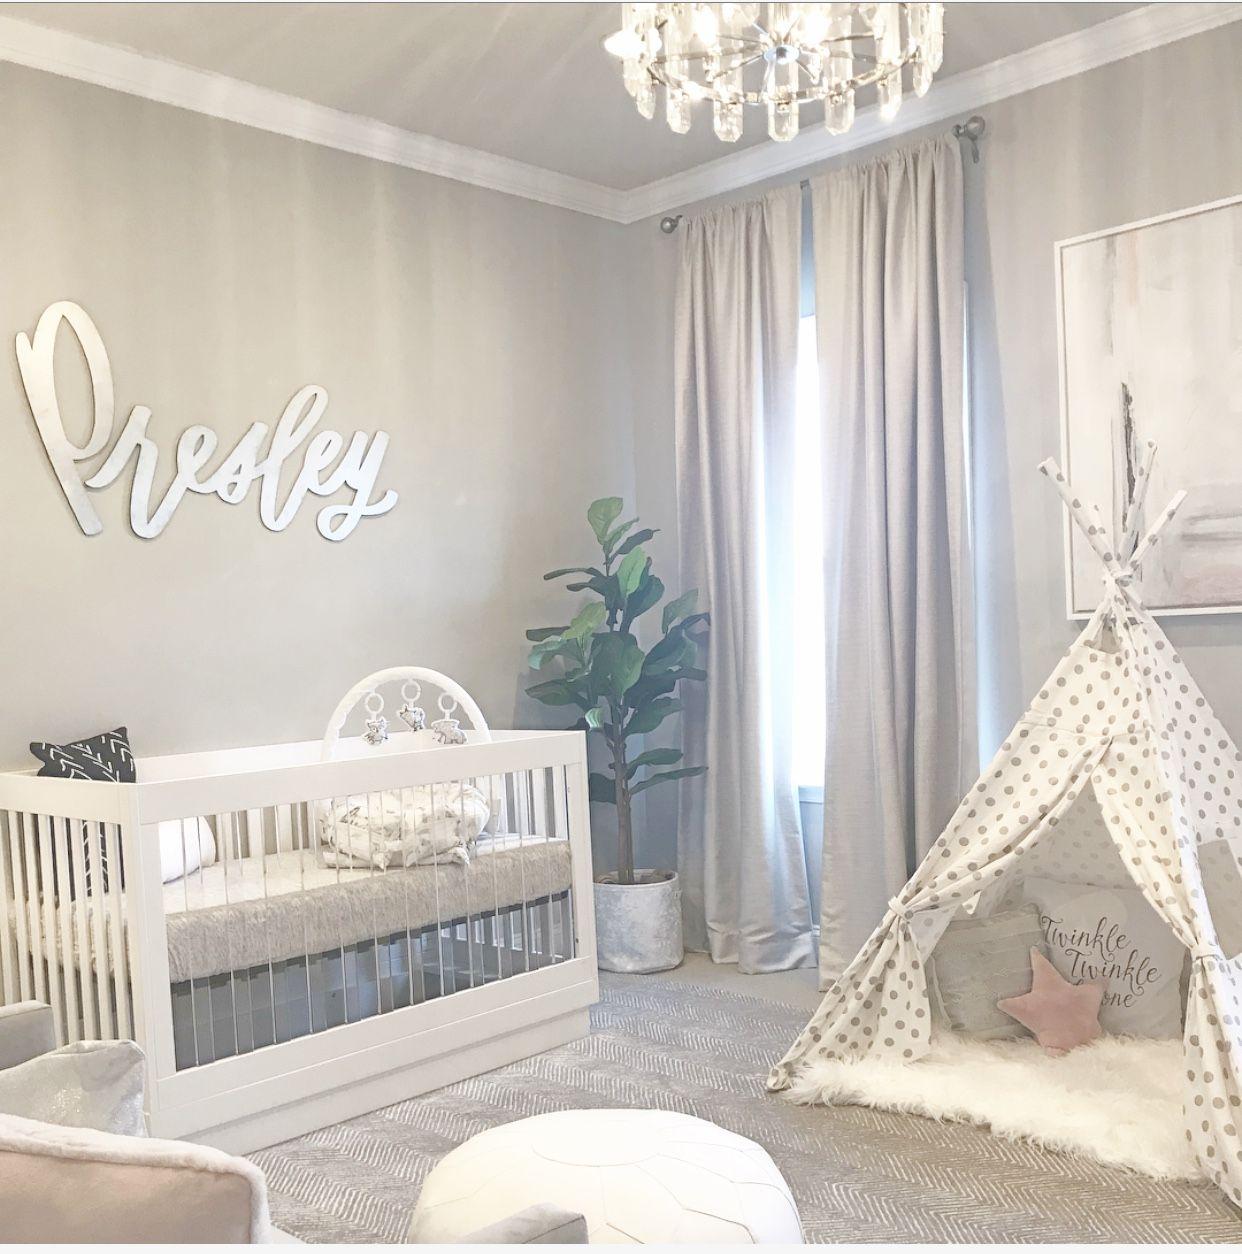 Presley Project Nursery Nursery Baby Room Baby Nursery